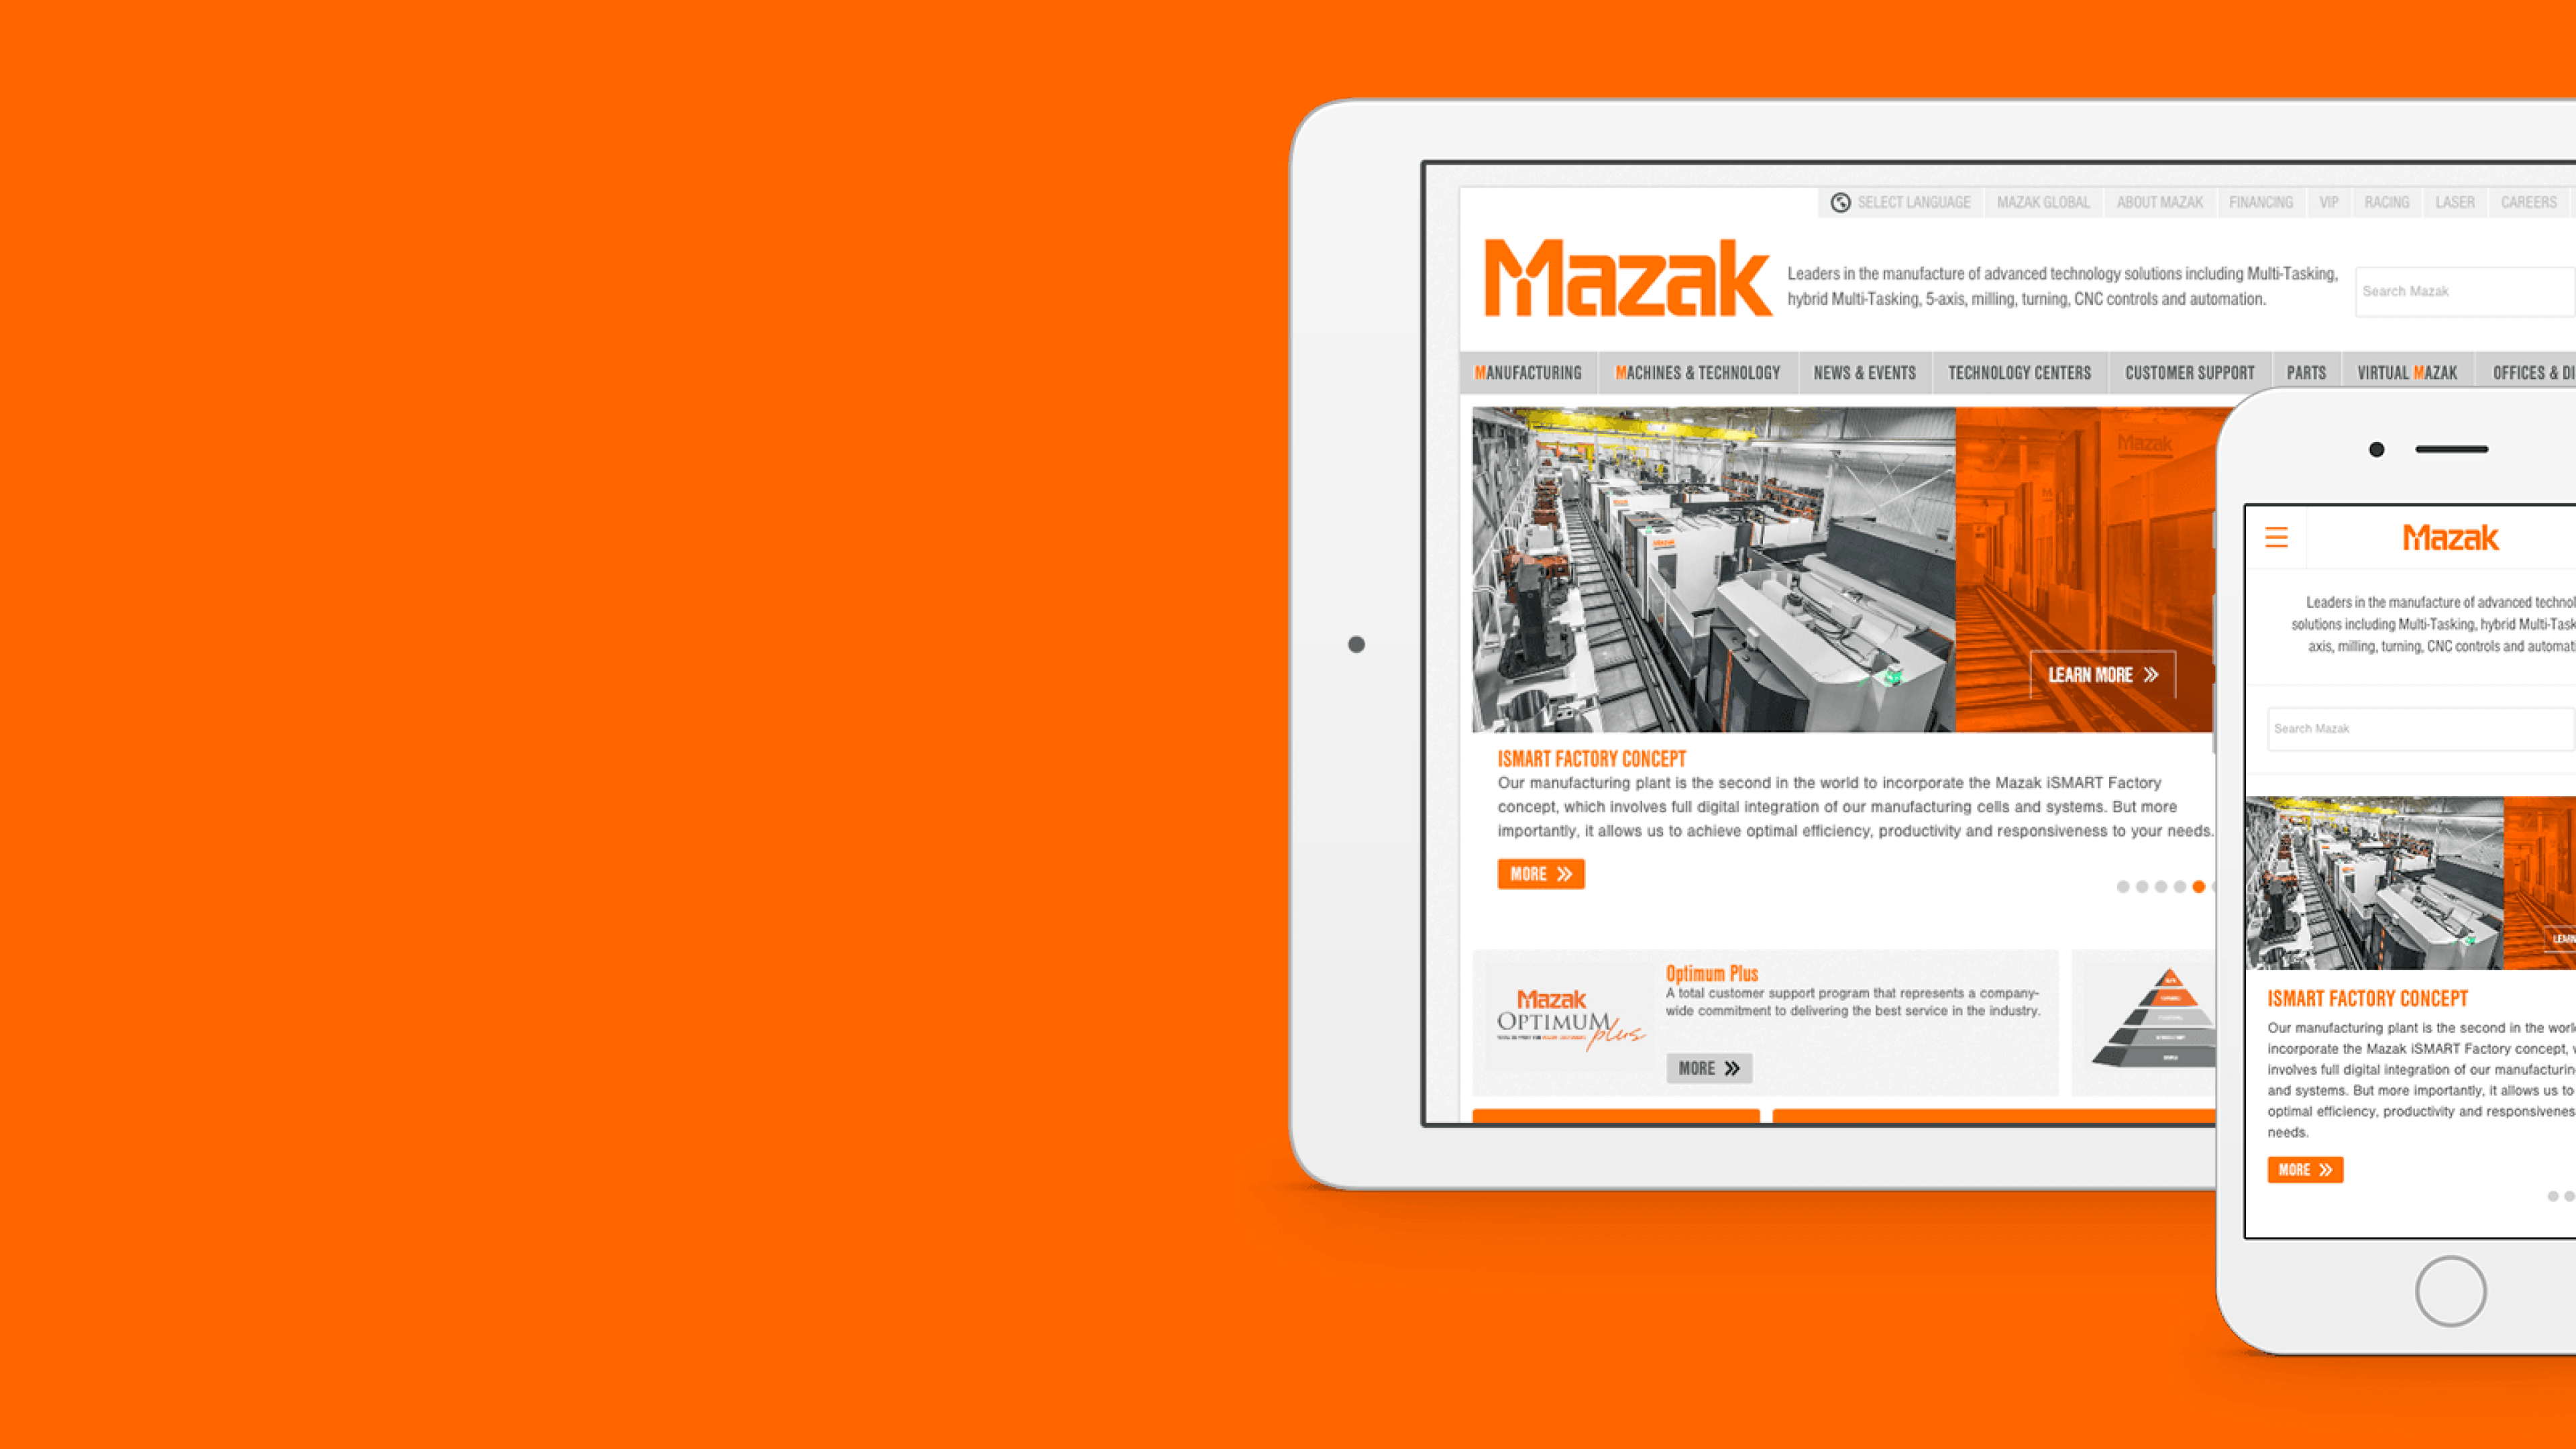 Mazak — Redesigning Mazak Corporation